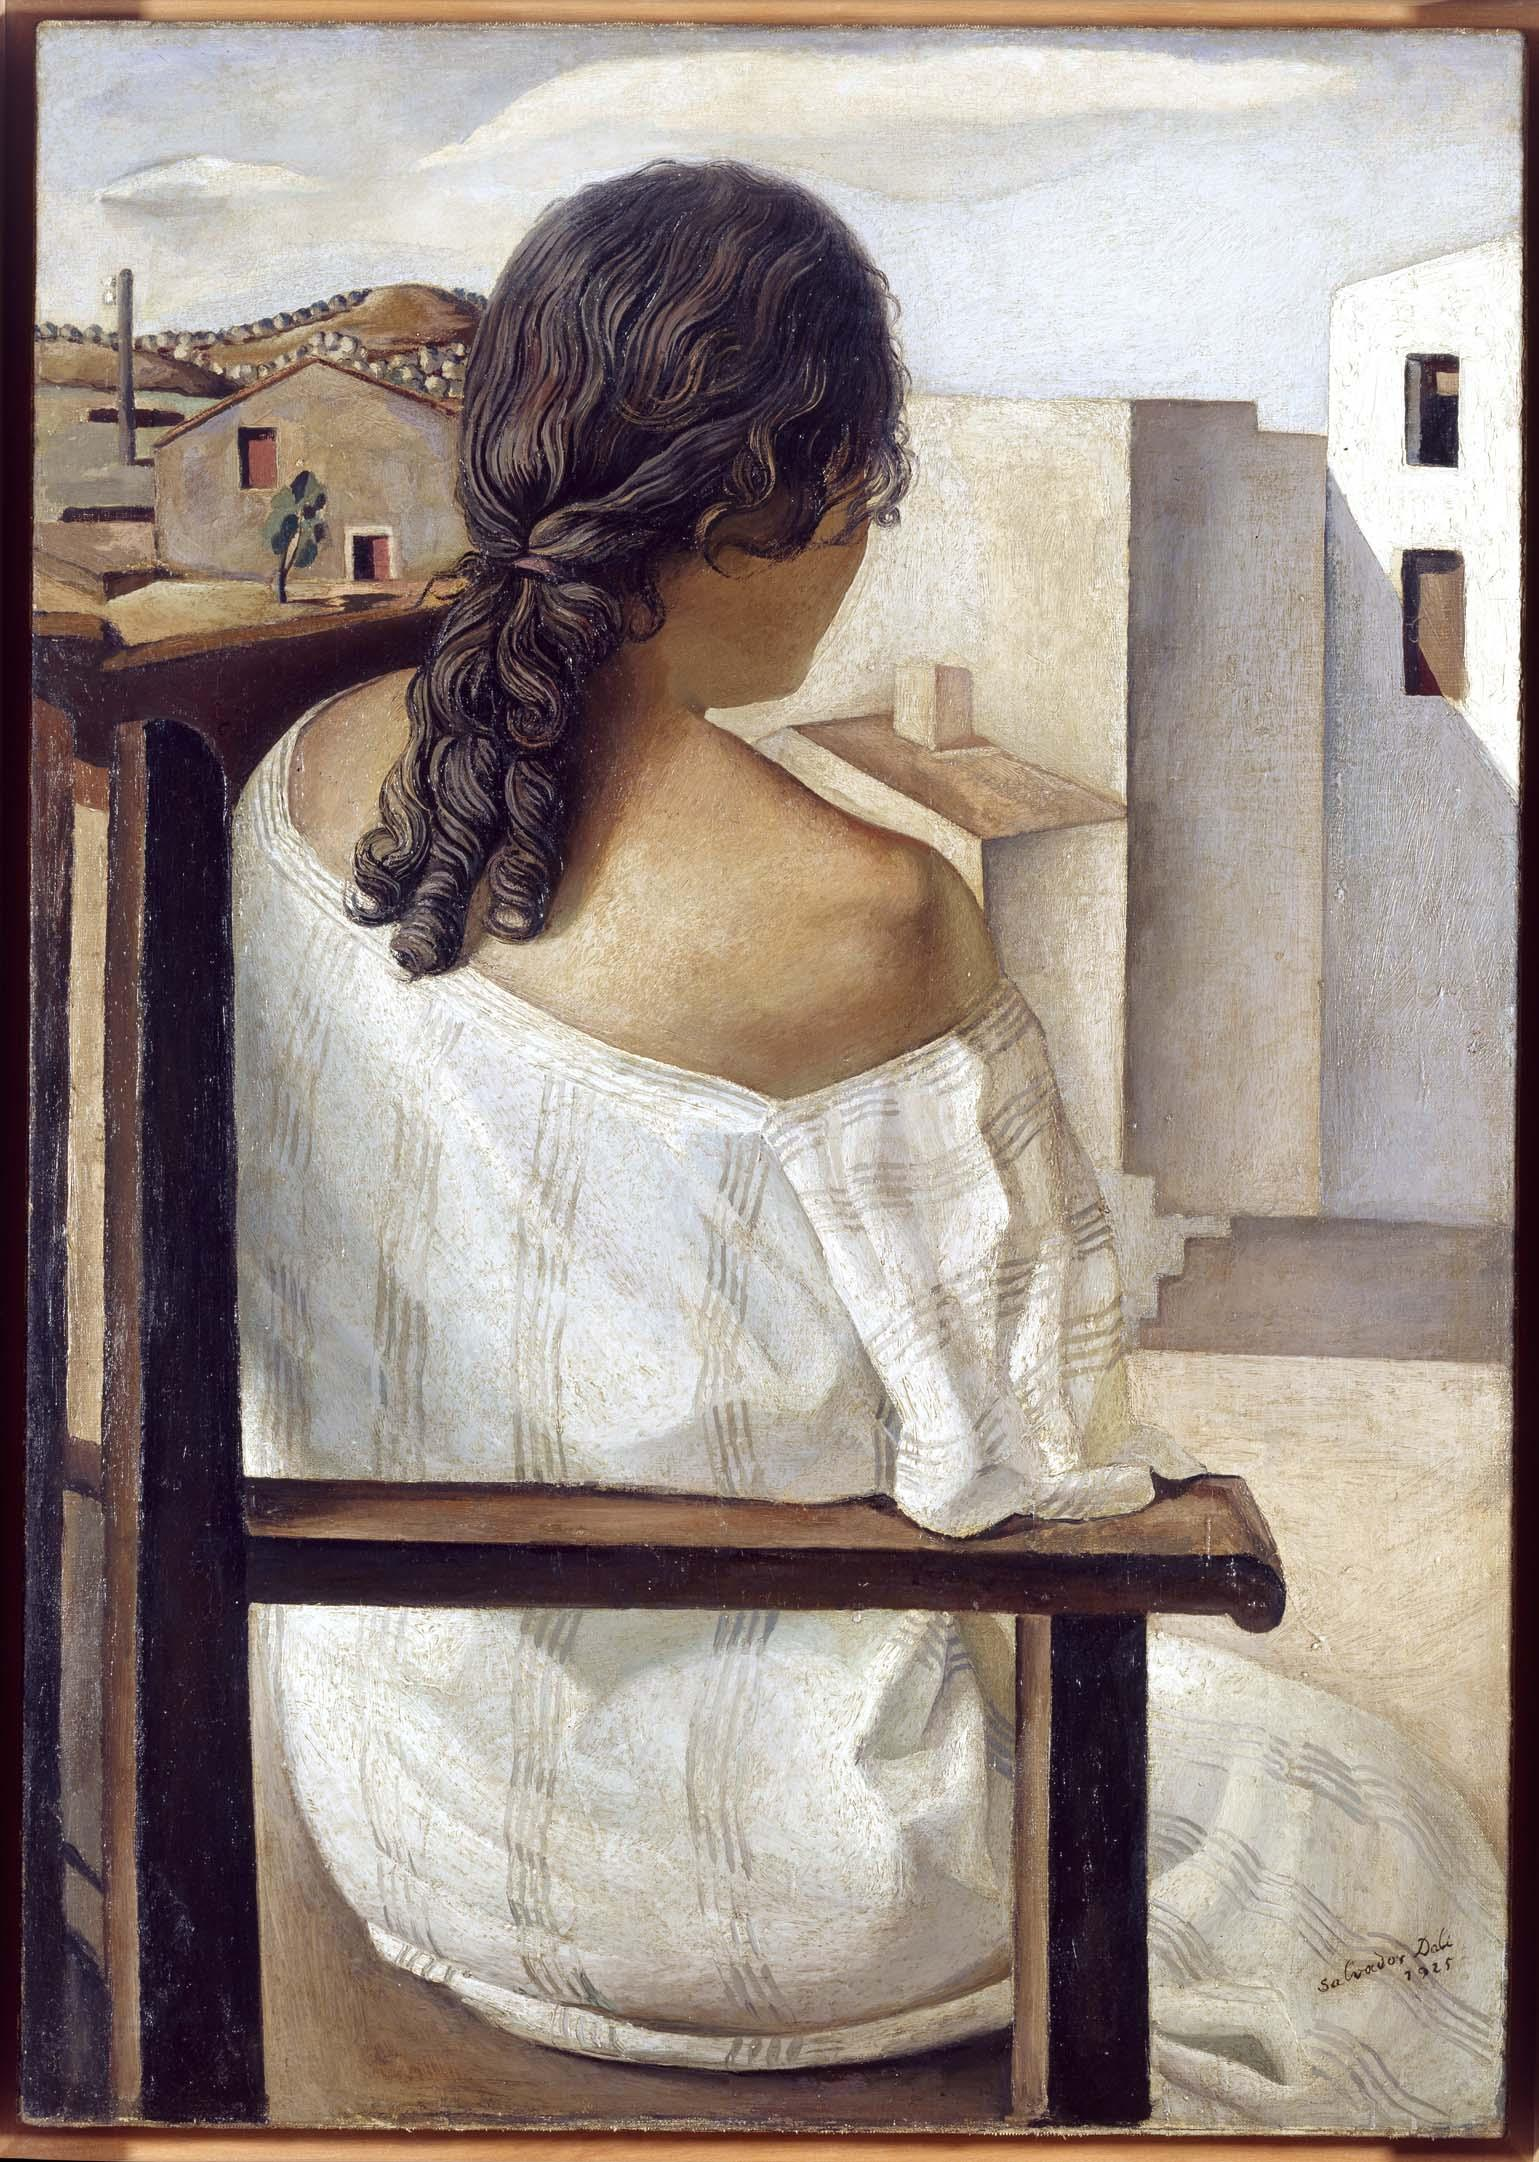 Salvador Dalí - Retrato (Portrait)